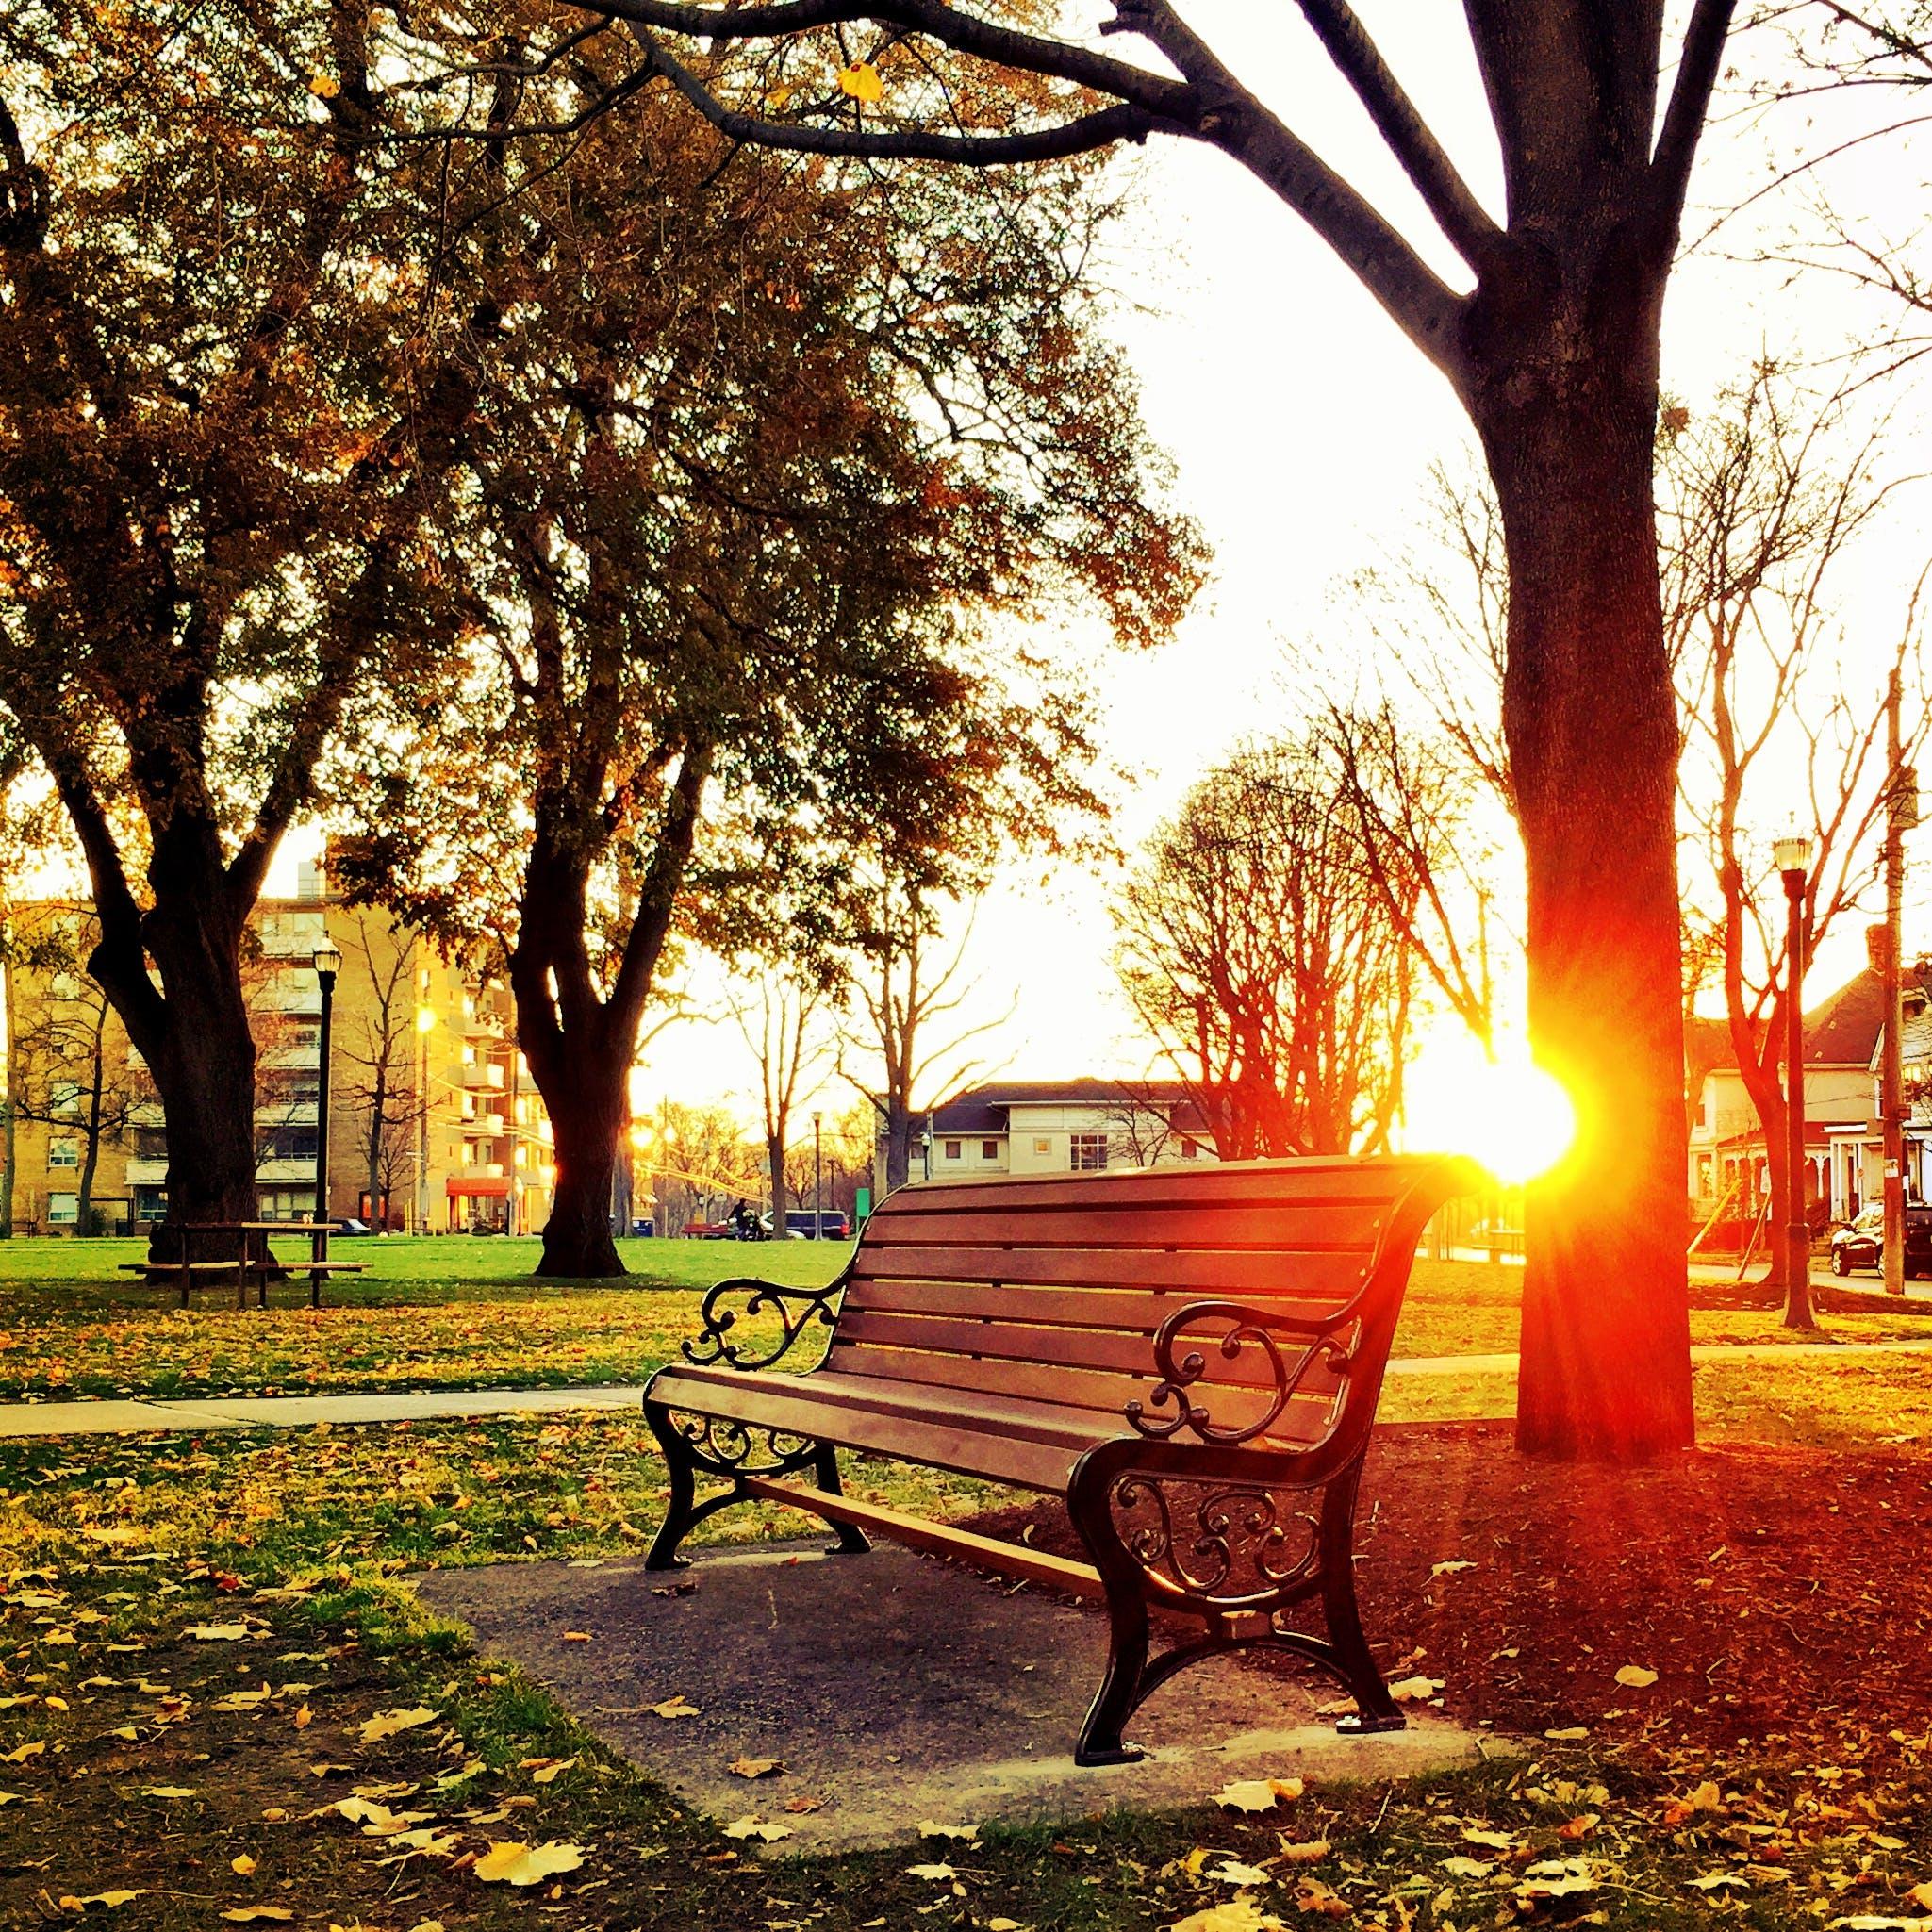 Brown Wooden Park Bench Under Green Leaf Tree during Sunset